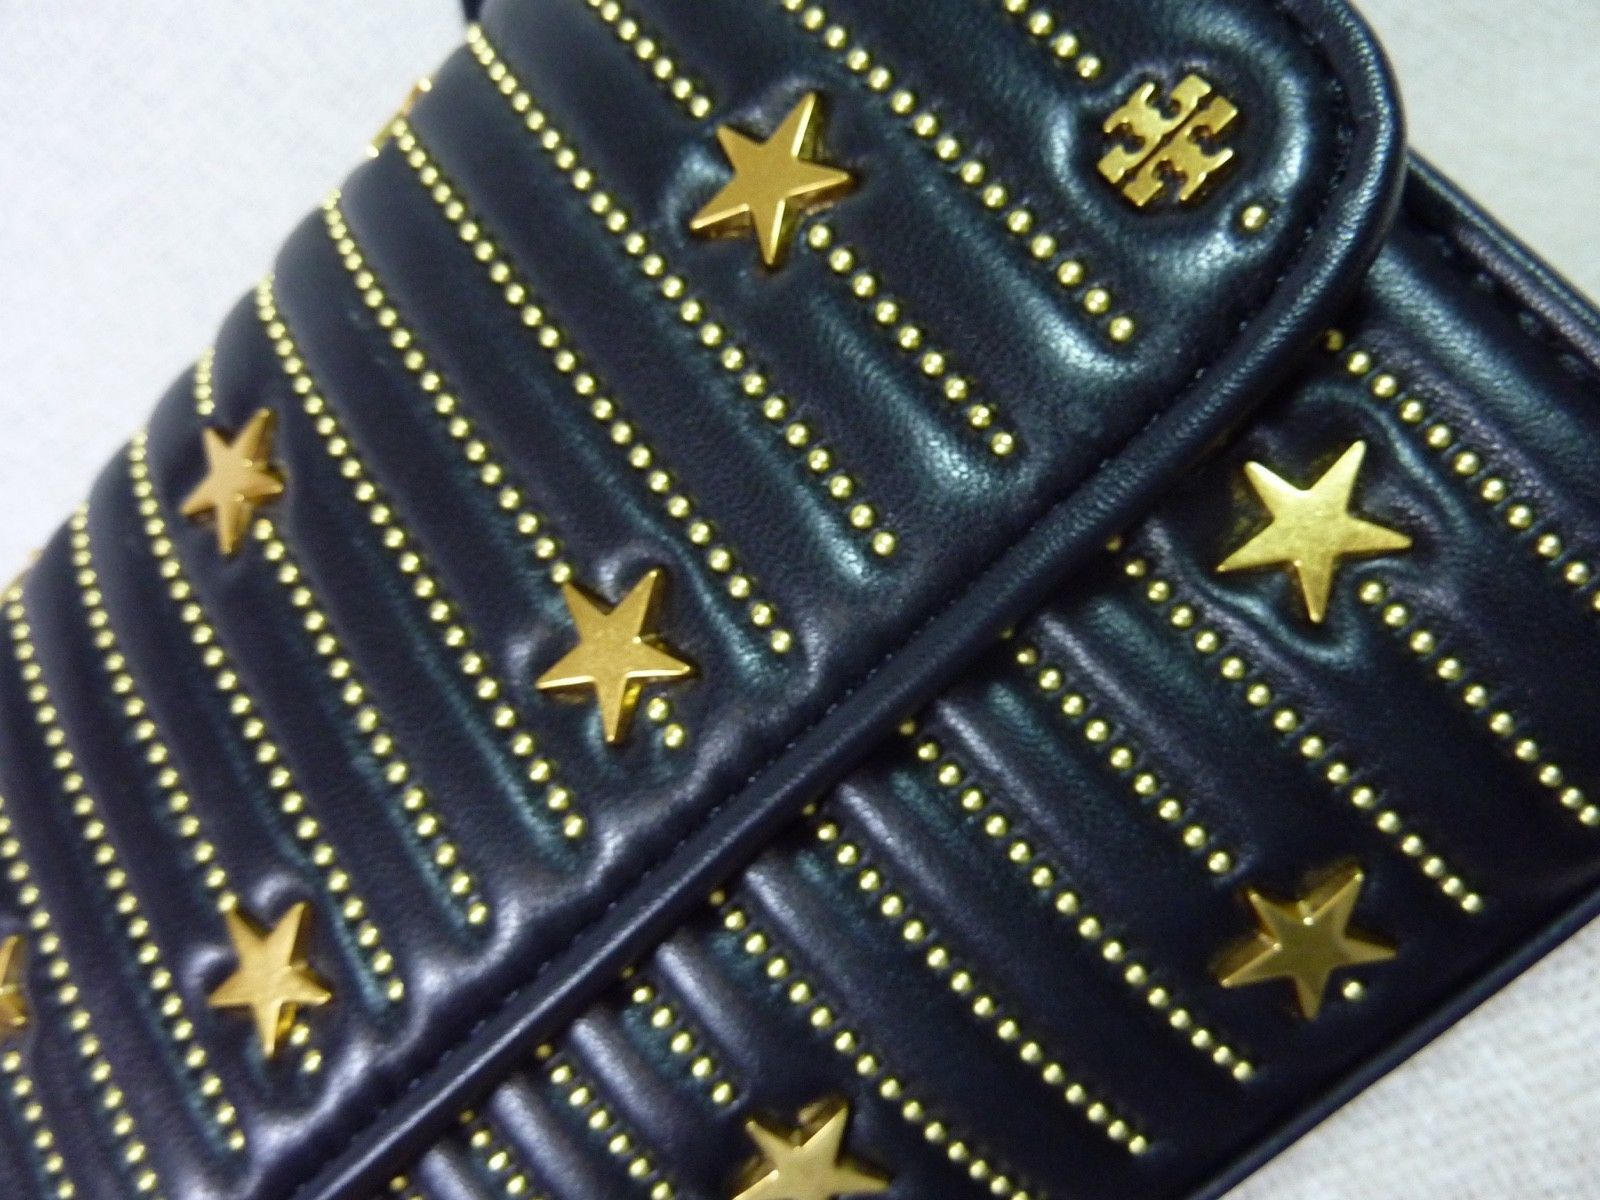 NWT Tory Burch Black Fleming Star-Stud Small Convertible Bag $558 image 7